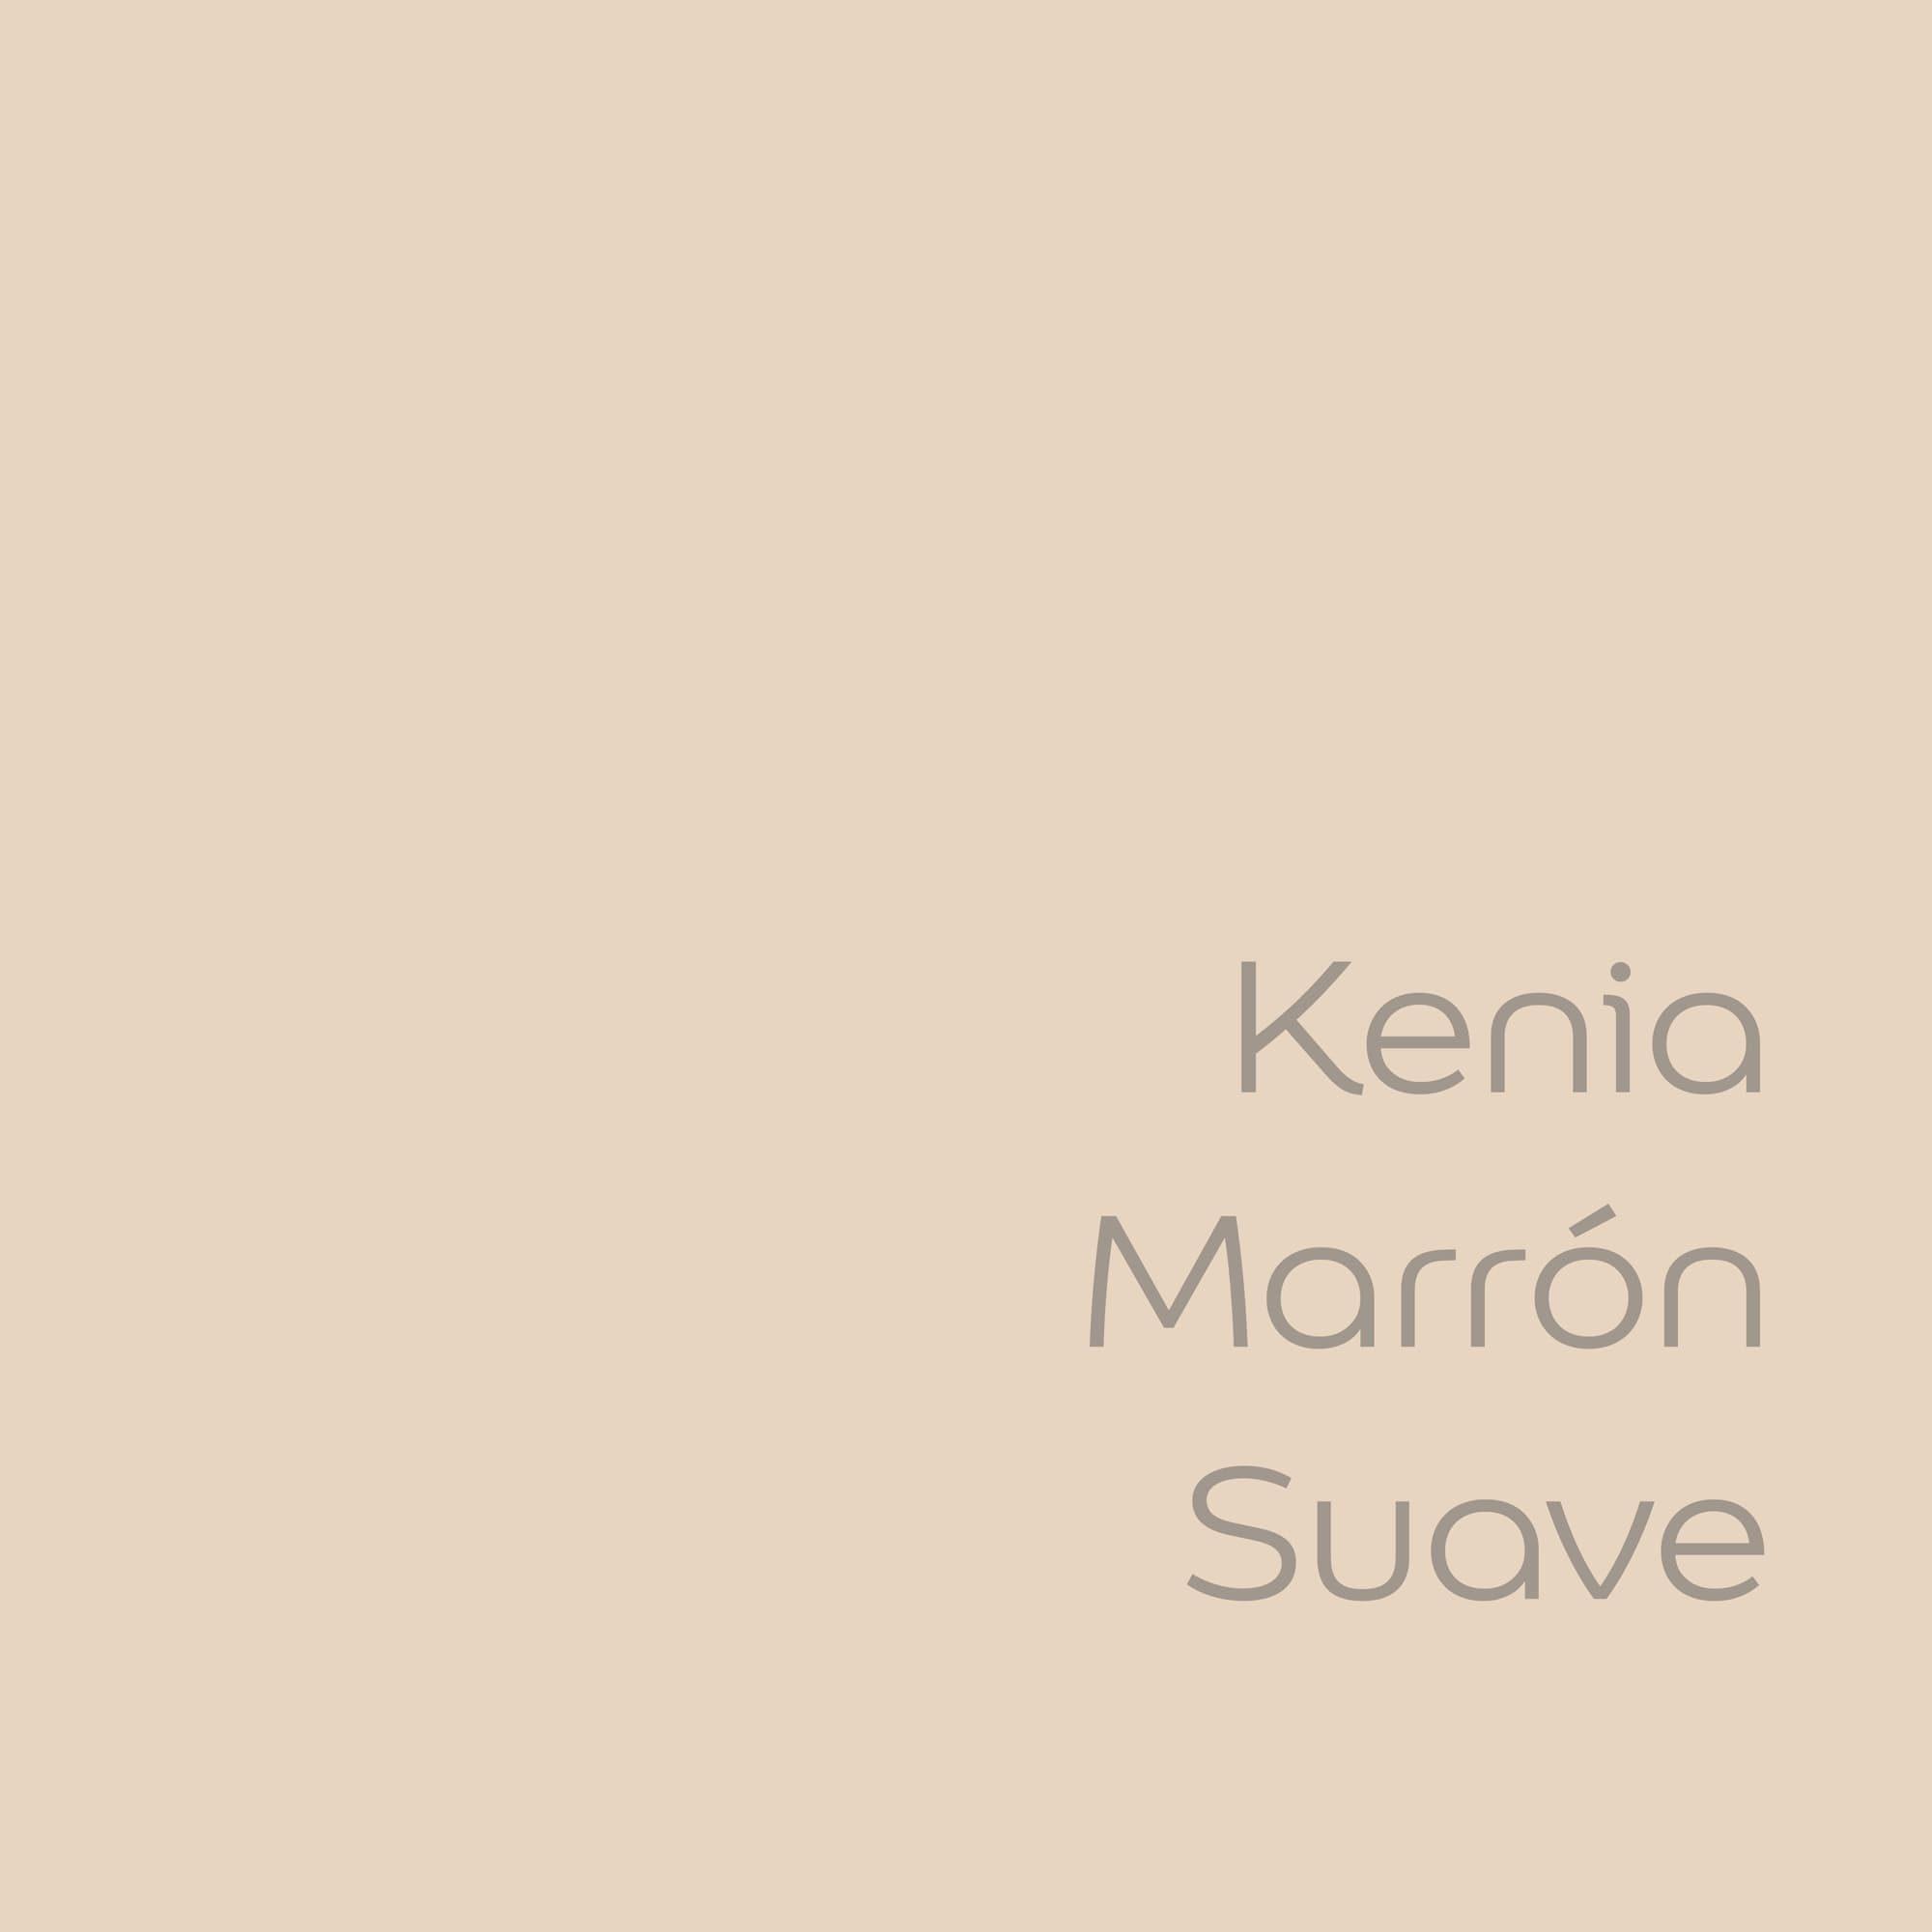 tester de color de pintura bruguer cdm kenia marron suave color